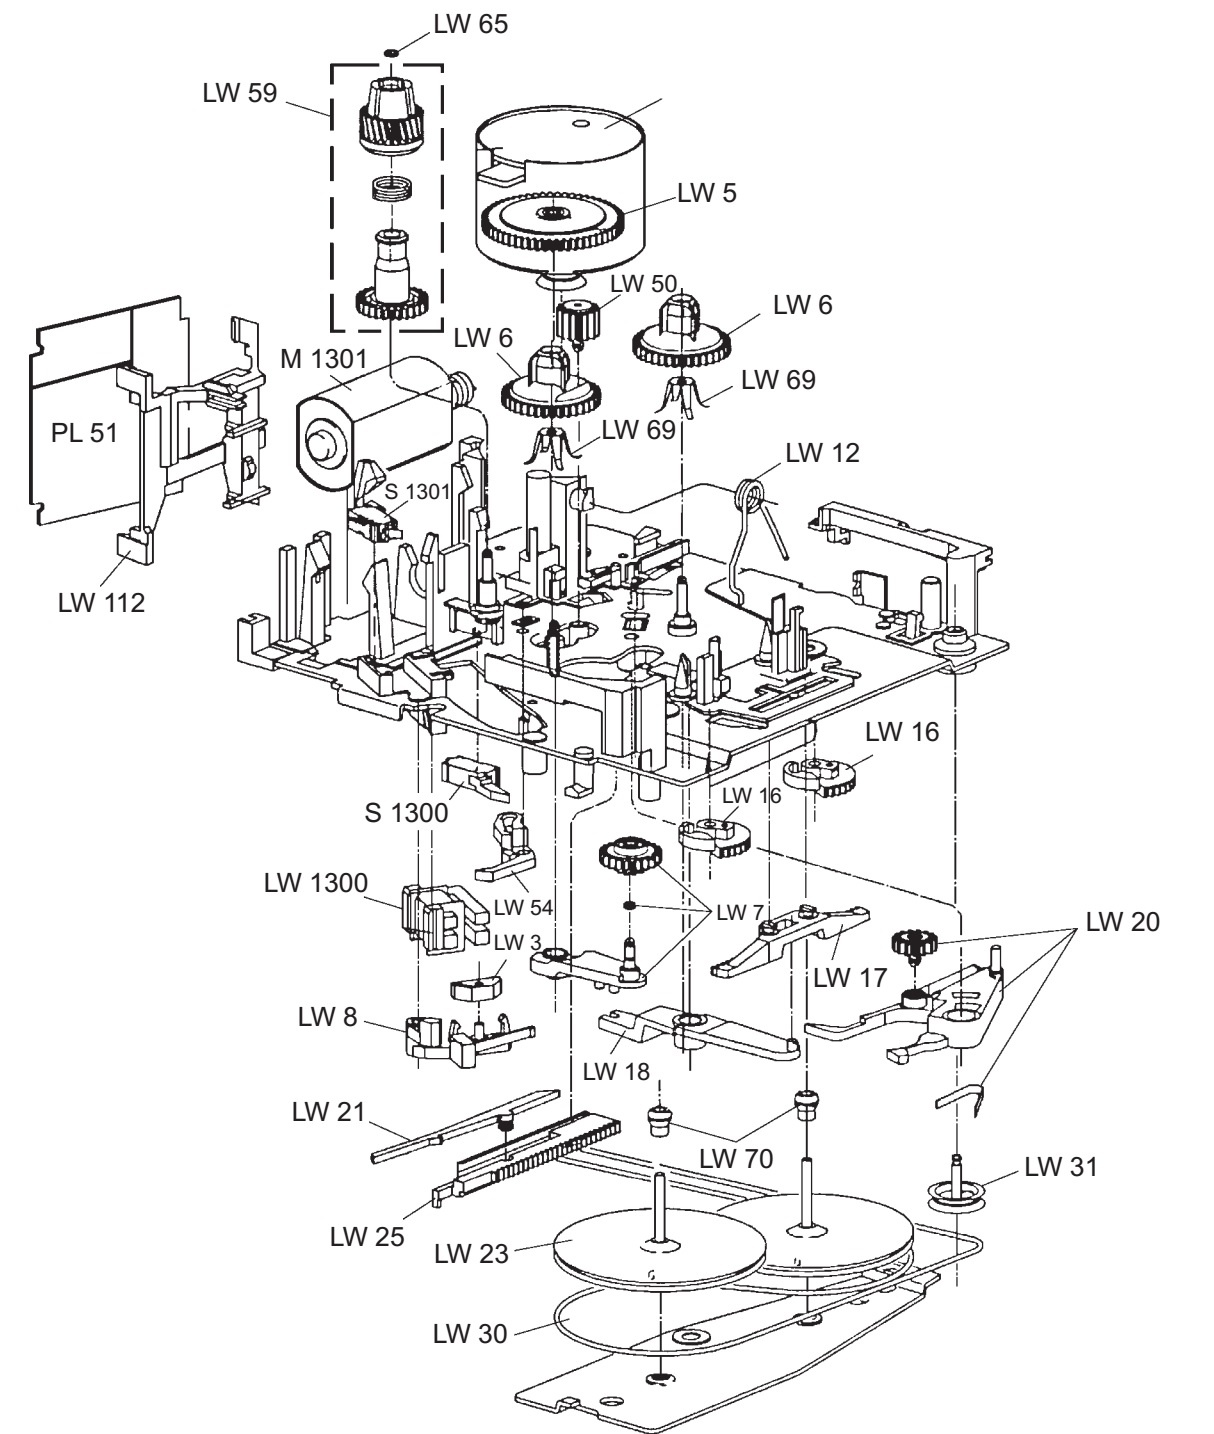 Blaupunkt Auto Radio Exploded View Circuit Diagram